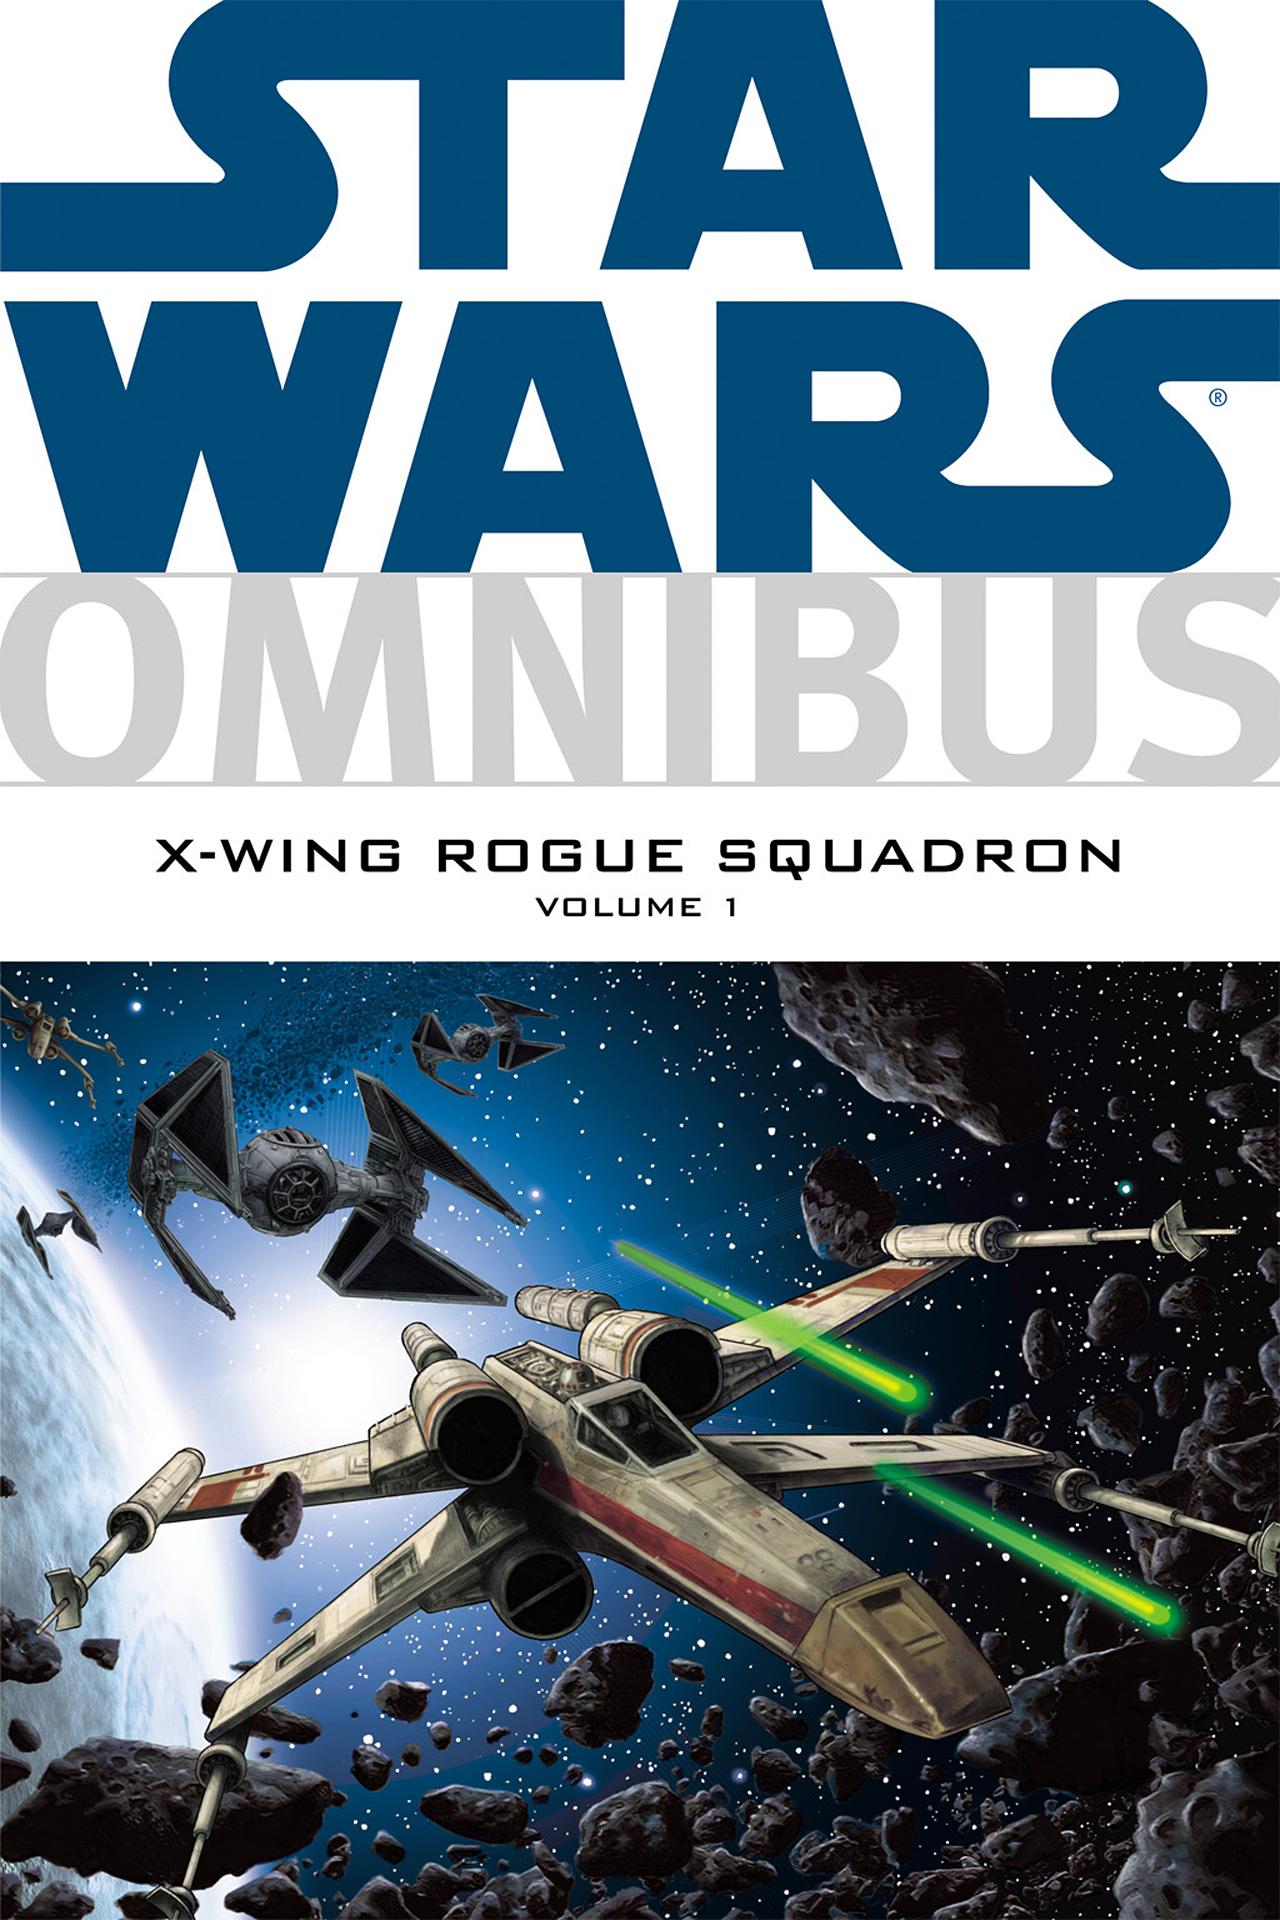 Read online Star Wars Omnibus comic -  Issue # Vol. 1 - 1